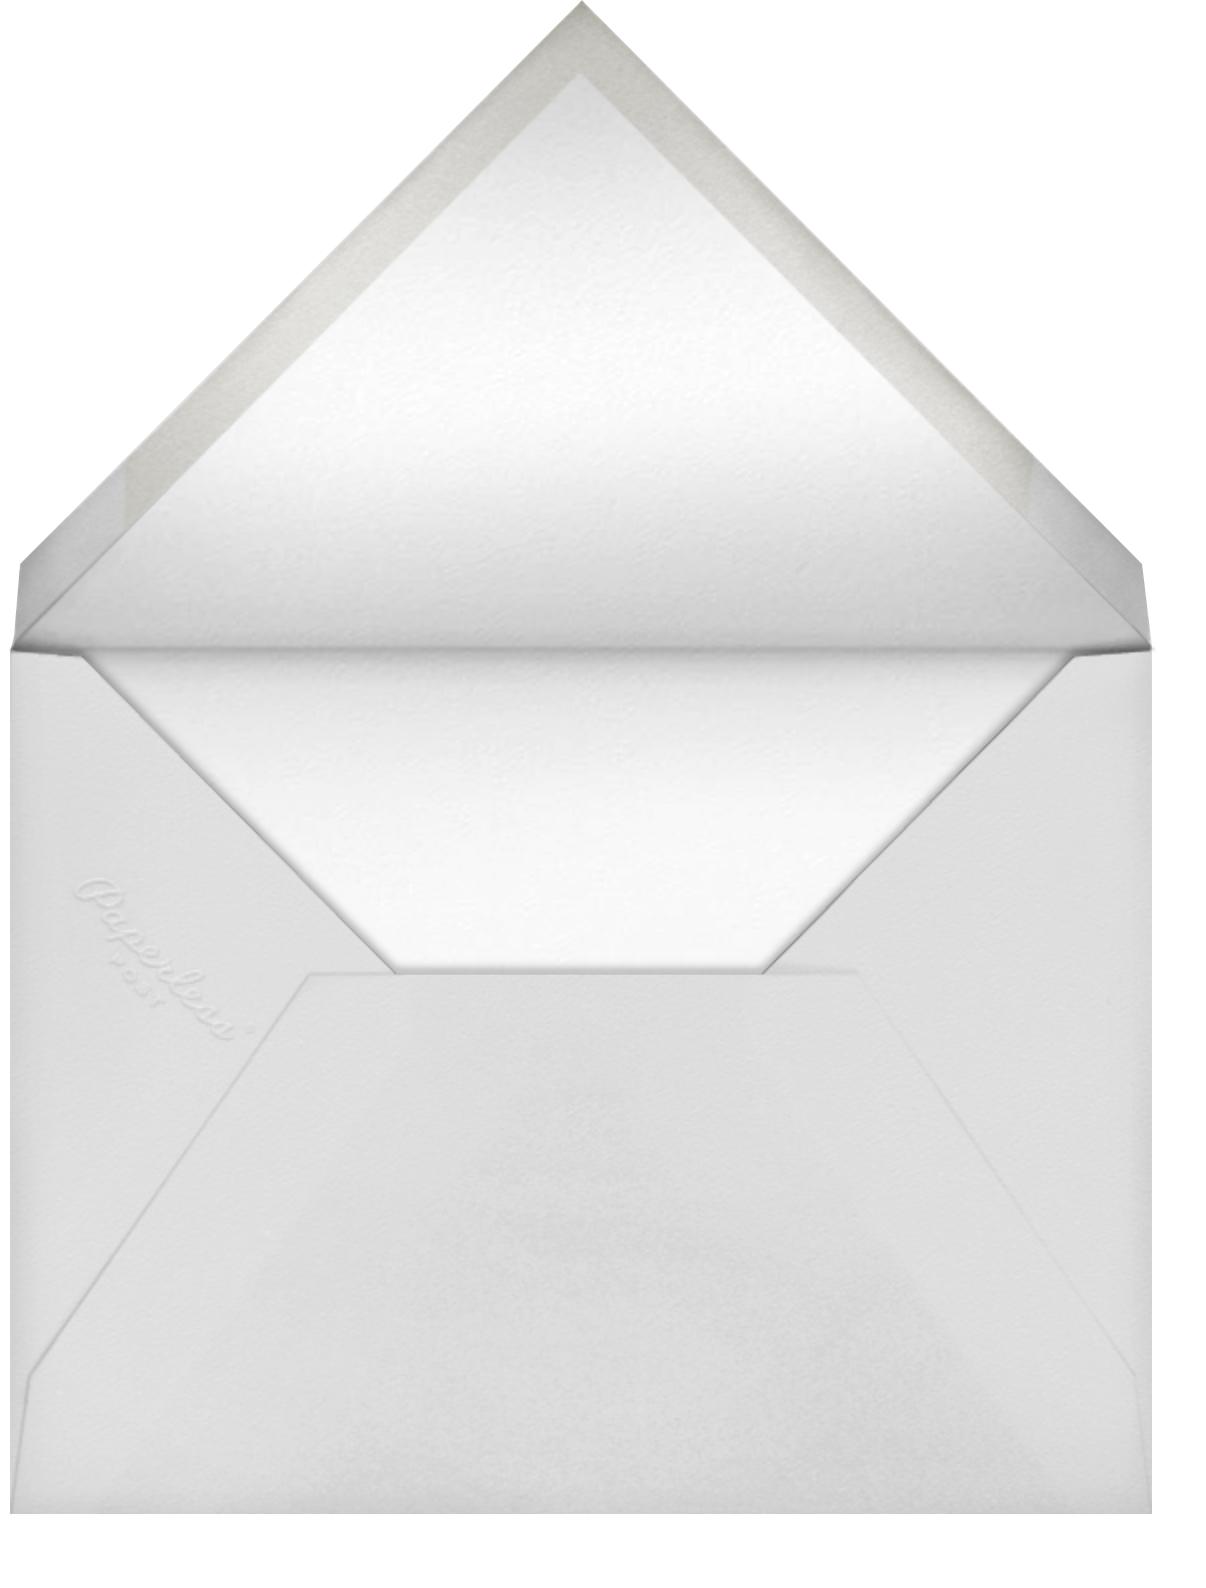 Stella And Dot Dots - Orange - Paperless Post - null - envelope back